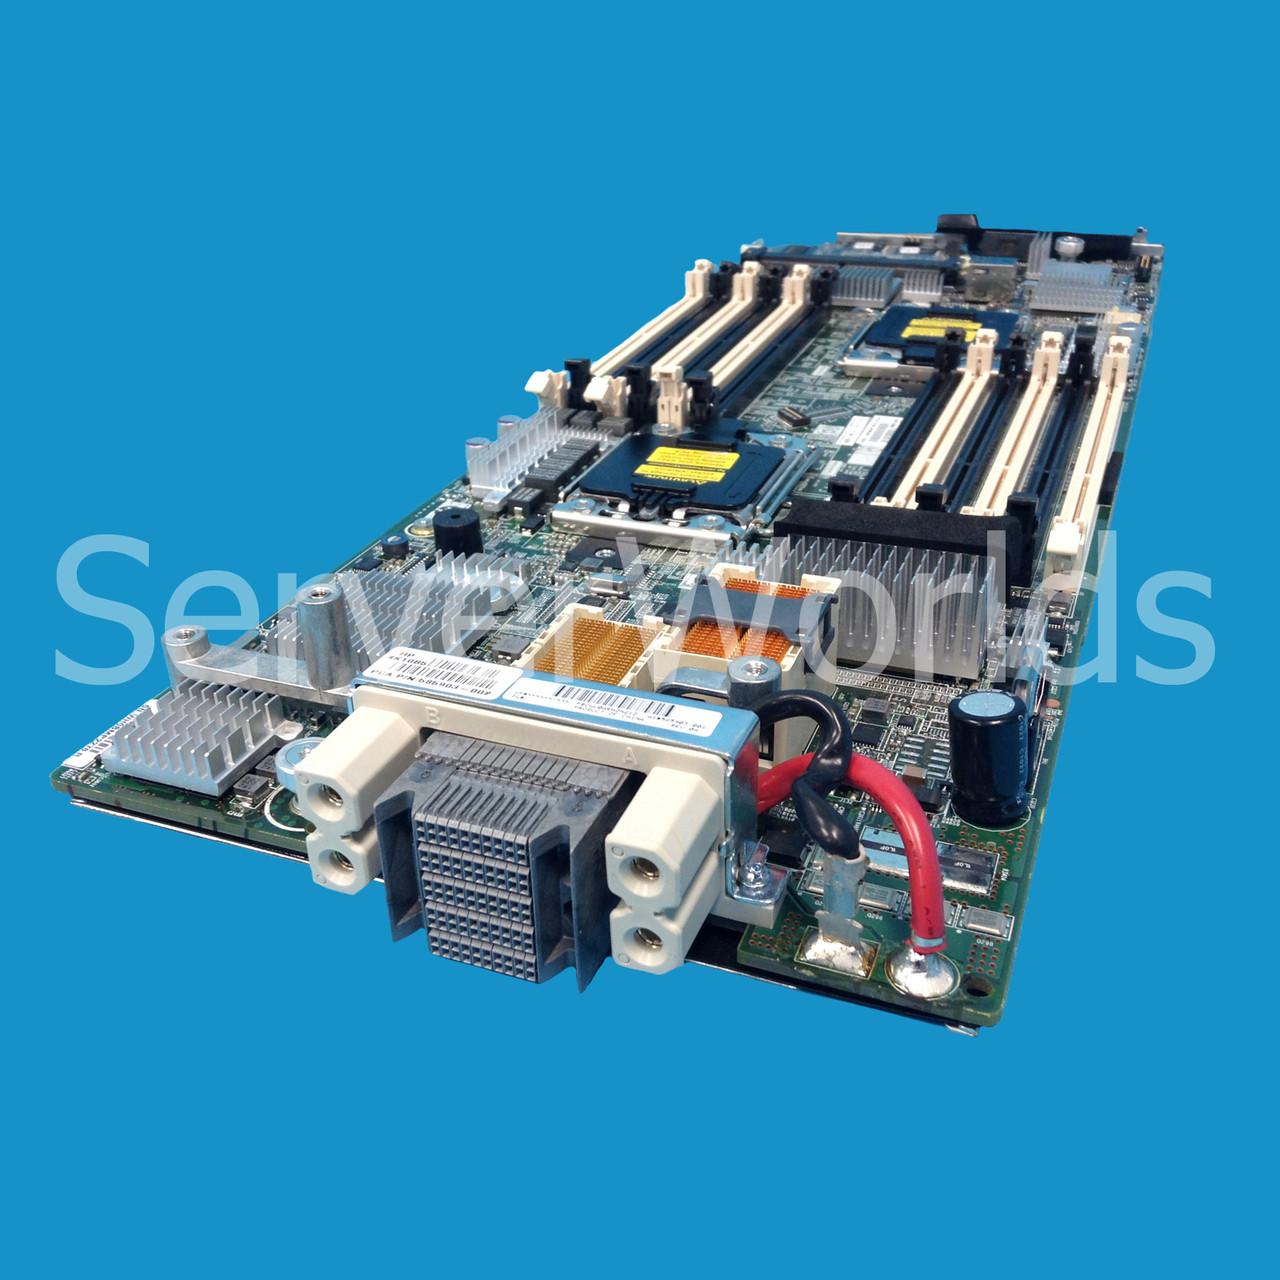 HP 531221-001 | BL460C G6 System Board - Serverworlds